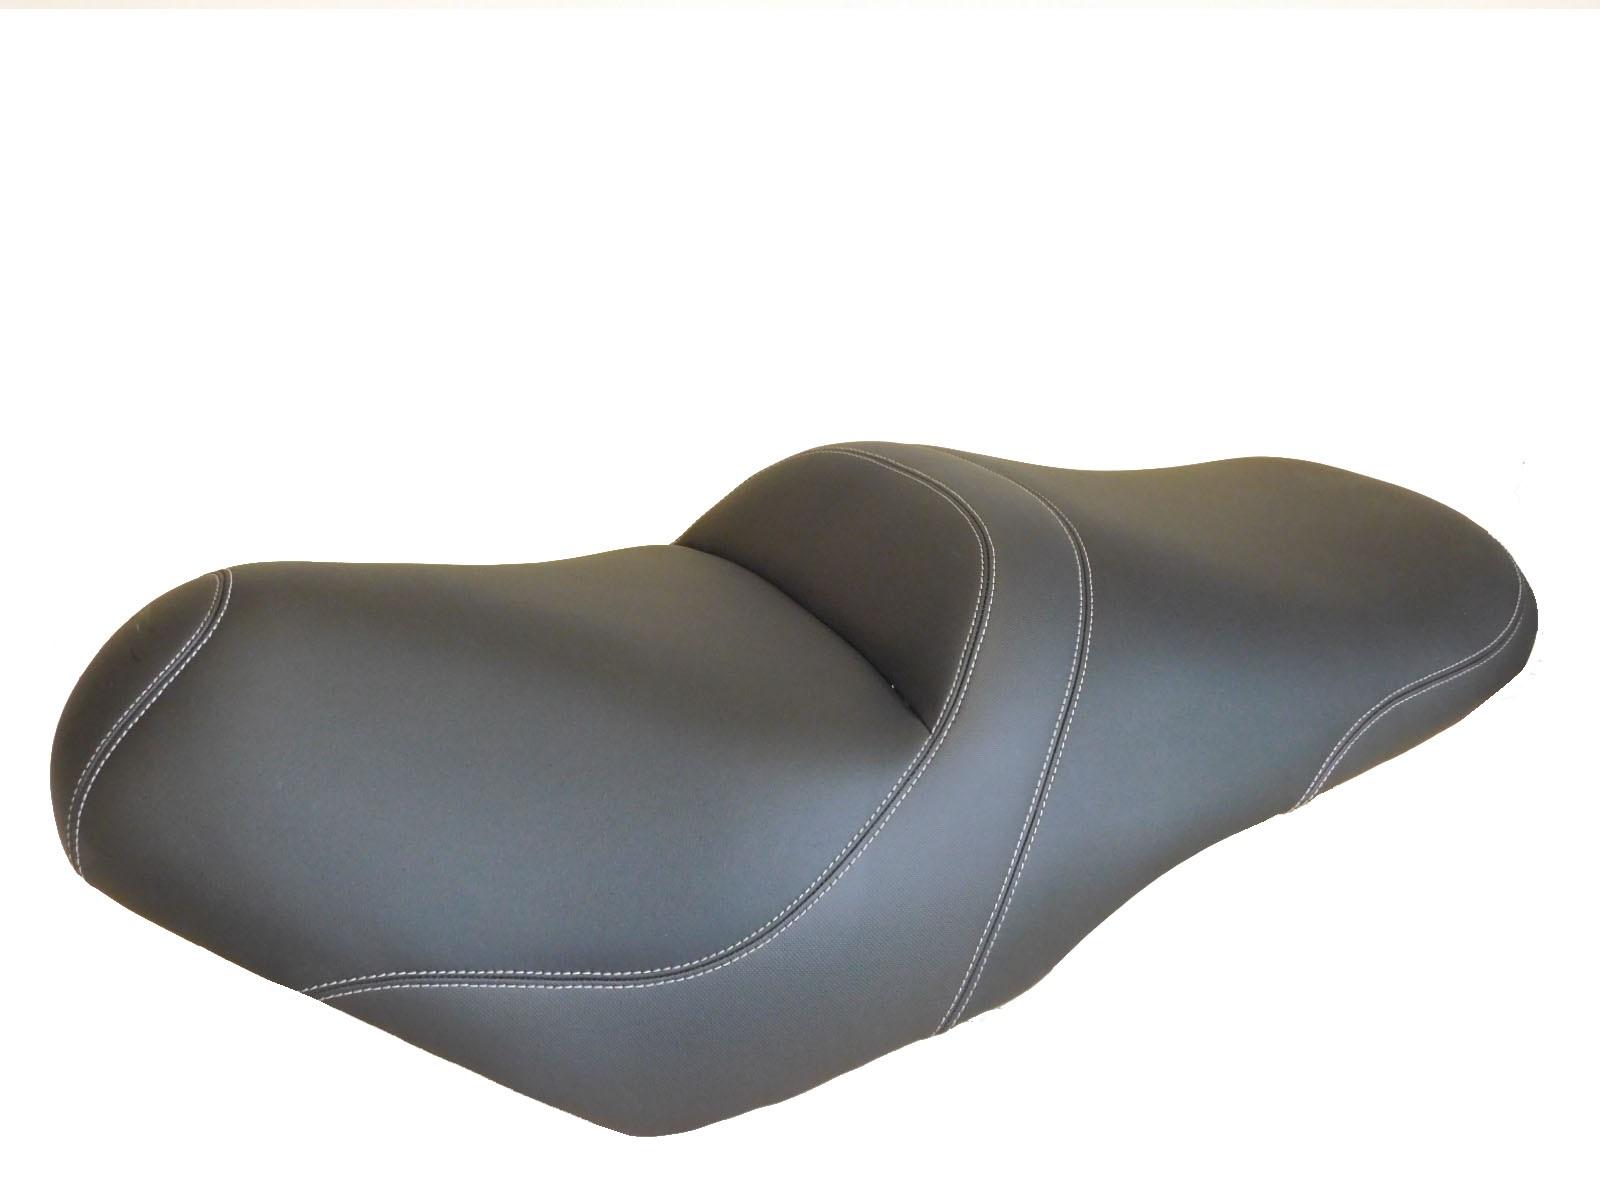 Asiento Gran Confort SGC4382 - SUZUKI BURGMAN 650 [2002-2012]